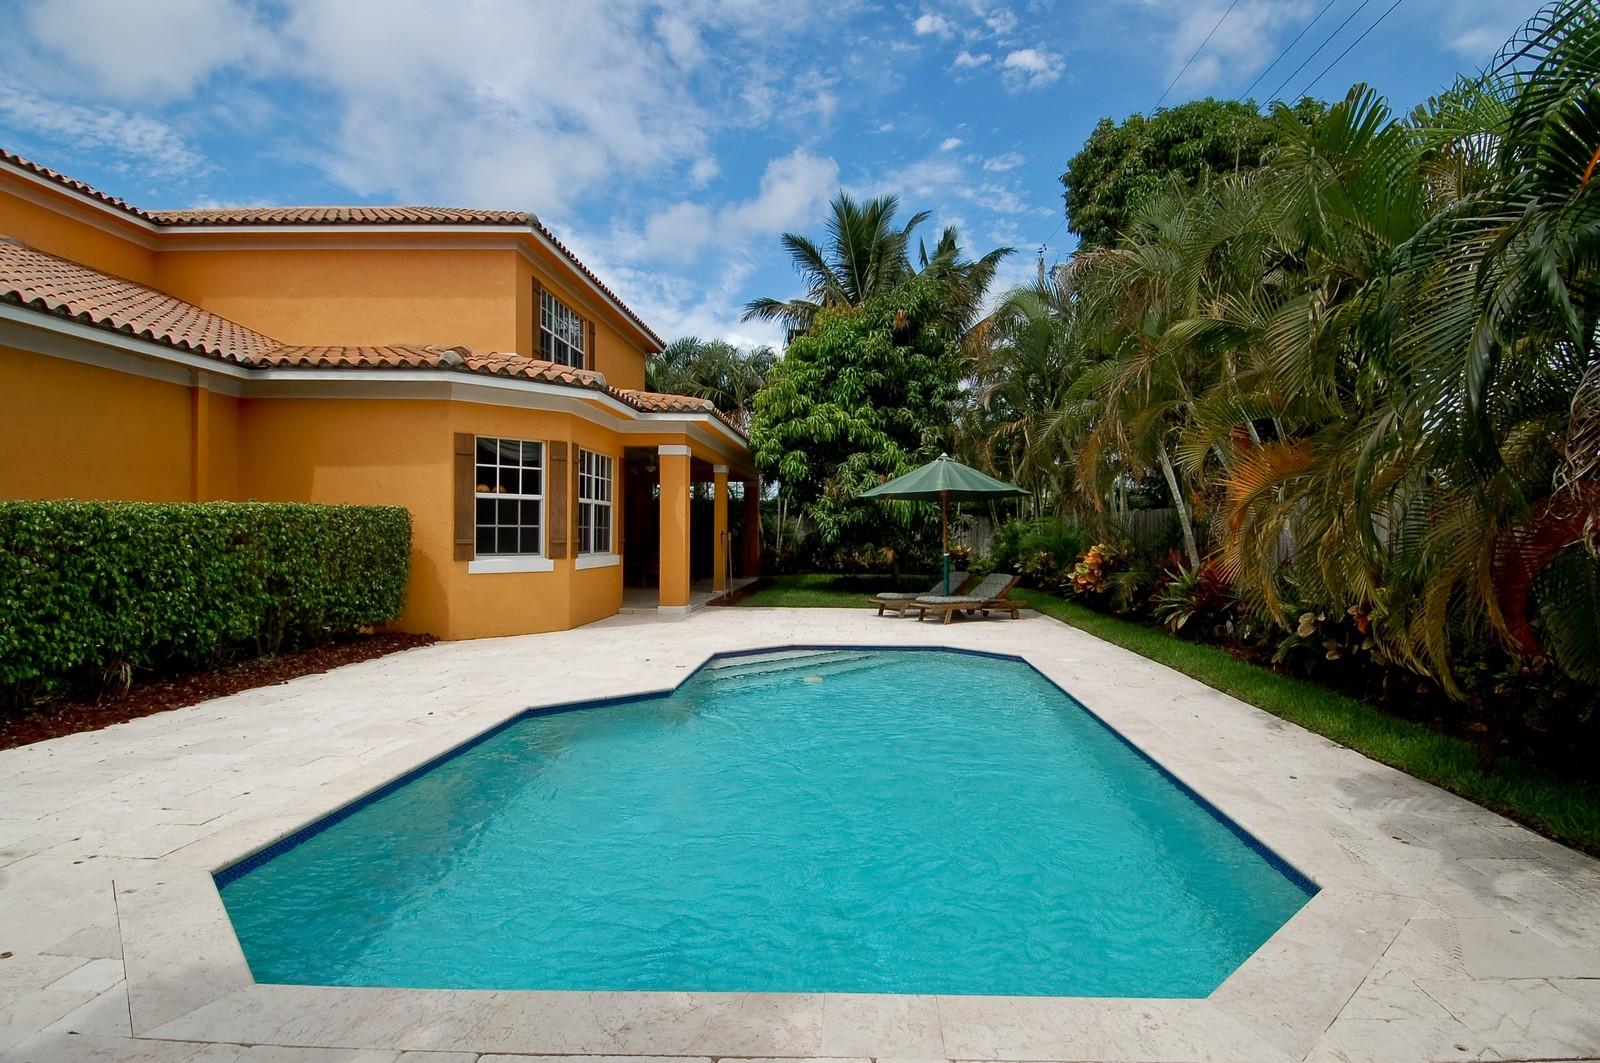 Real Estate Photography - 355 NE 3rd Ct, Boca Raton, FL, 33432 - Pool